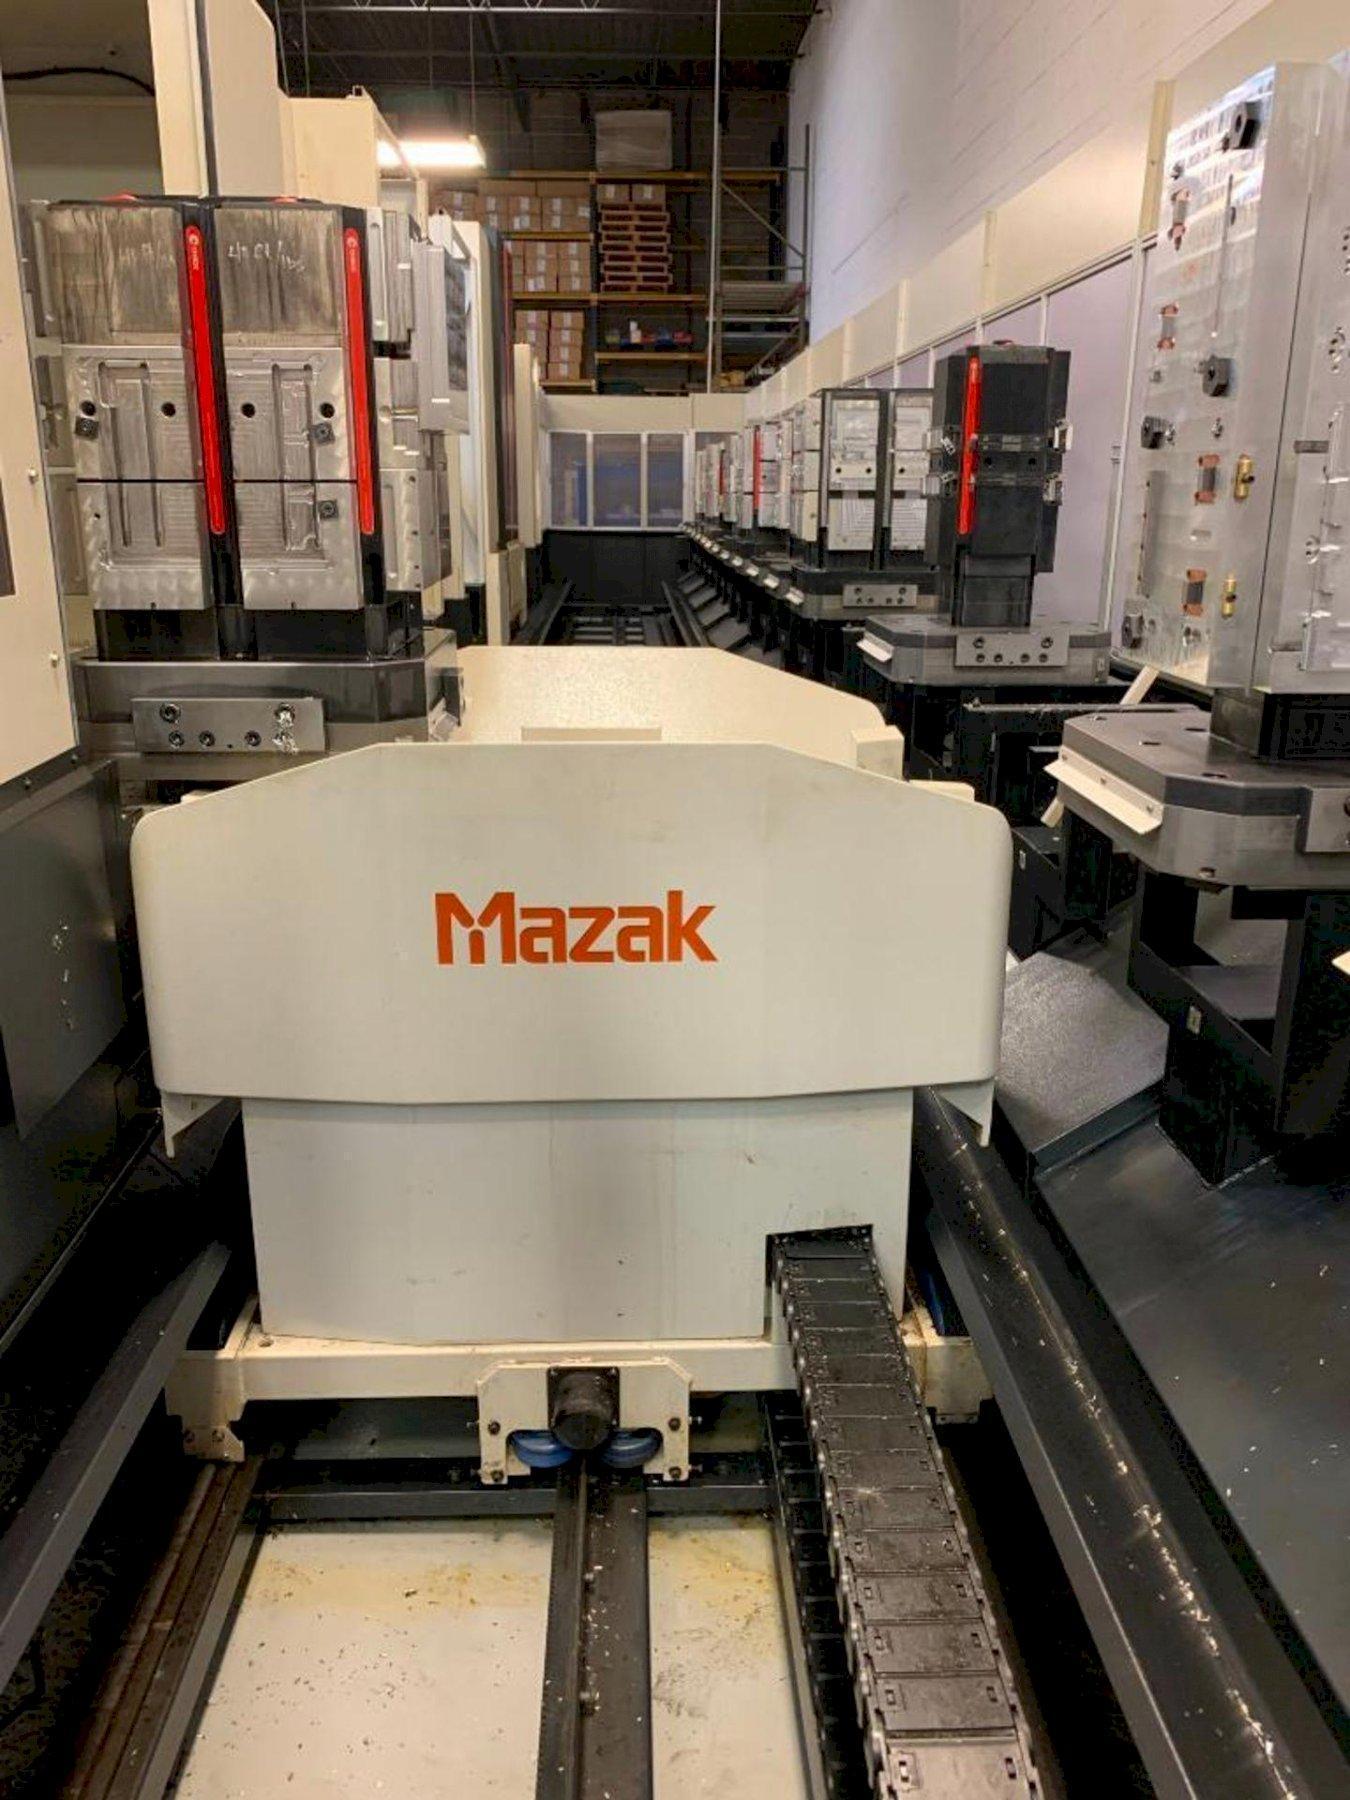 "Mazak HCN-5000 II CNC Horizontal Machining Centers(2) w/Palletech 18-Station Cell, Nexus Control, 19.7"" Pallets, 18K Spindle, 120 Position ATC, CTS, CAT 40, (3) Loading Stations, 2008/2011"